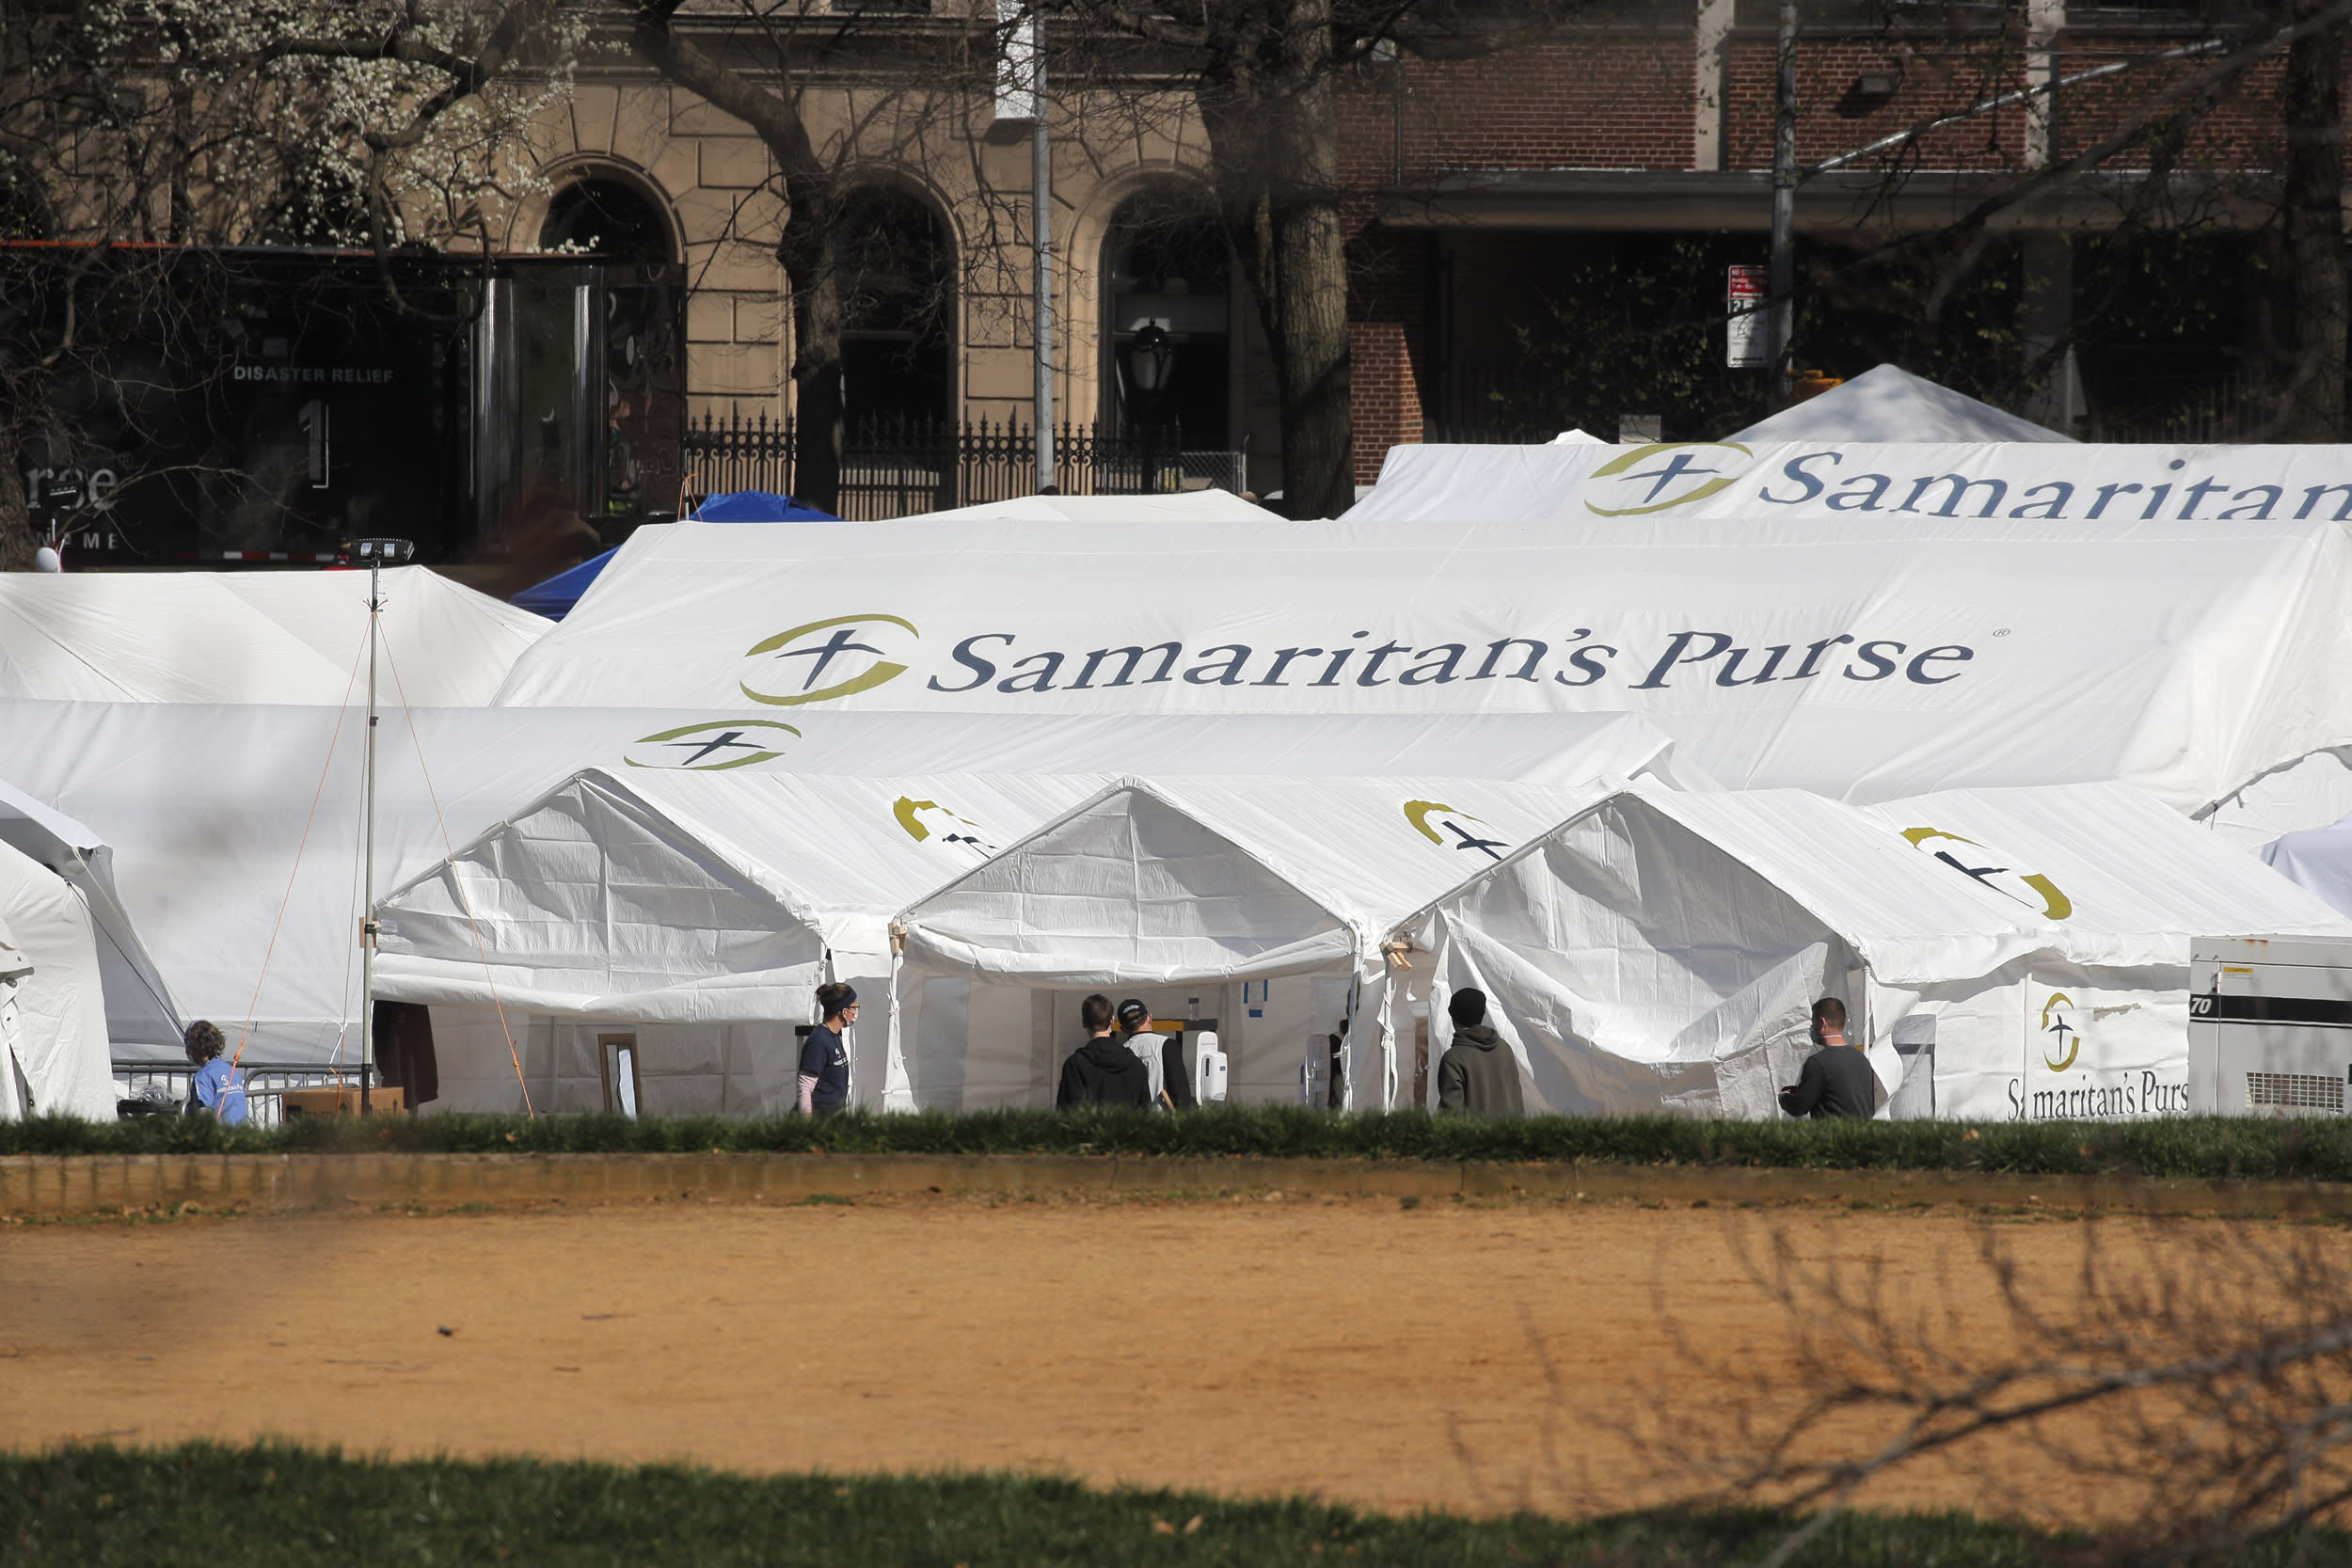 Opposition to Samaritan's Purse Central Park field ...